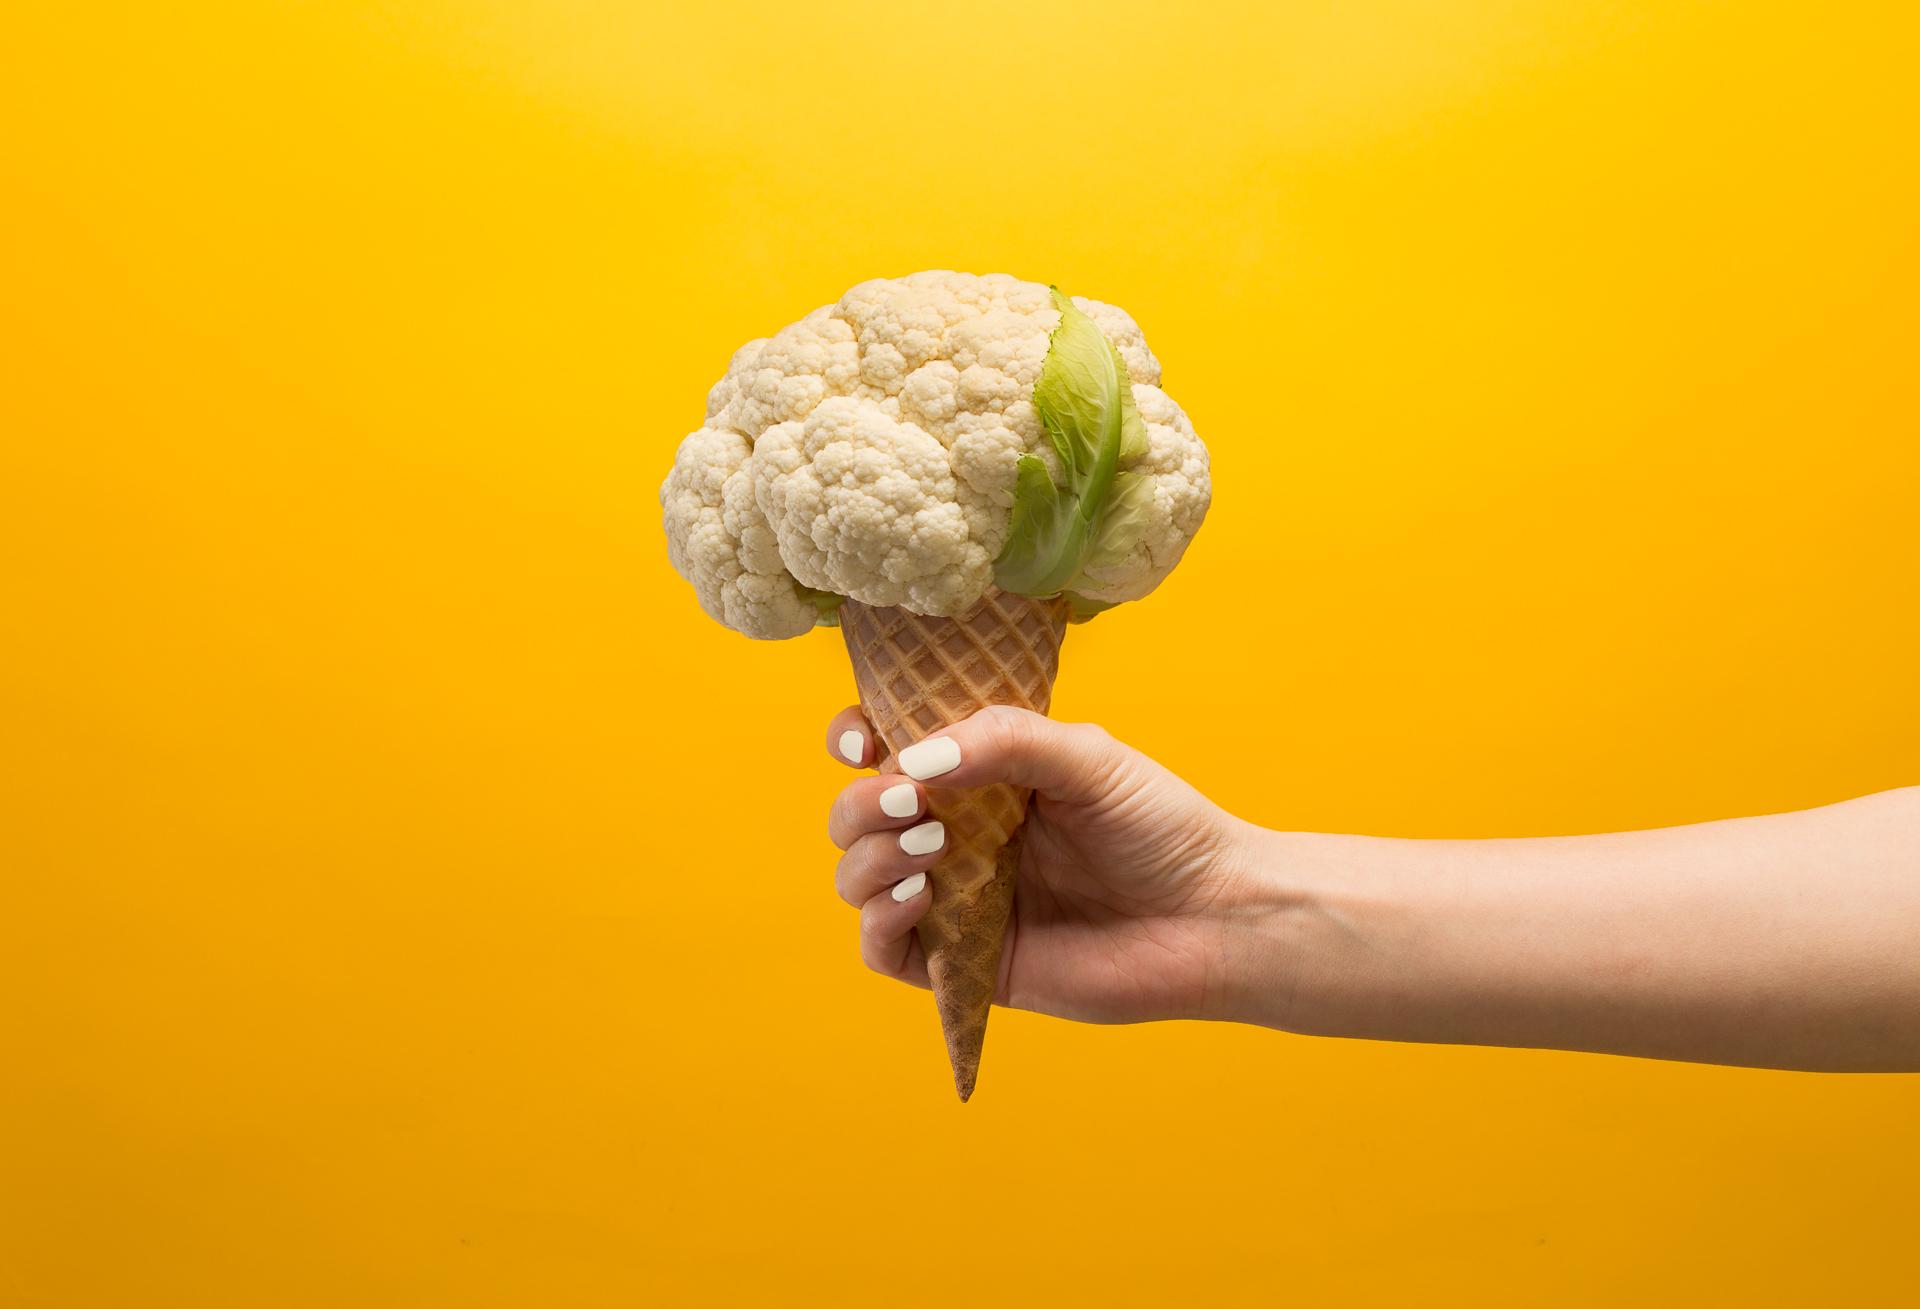 Cauliflower_Fized.jpg